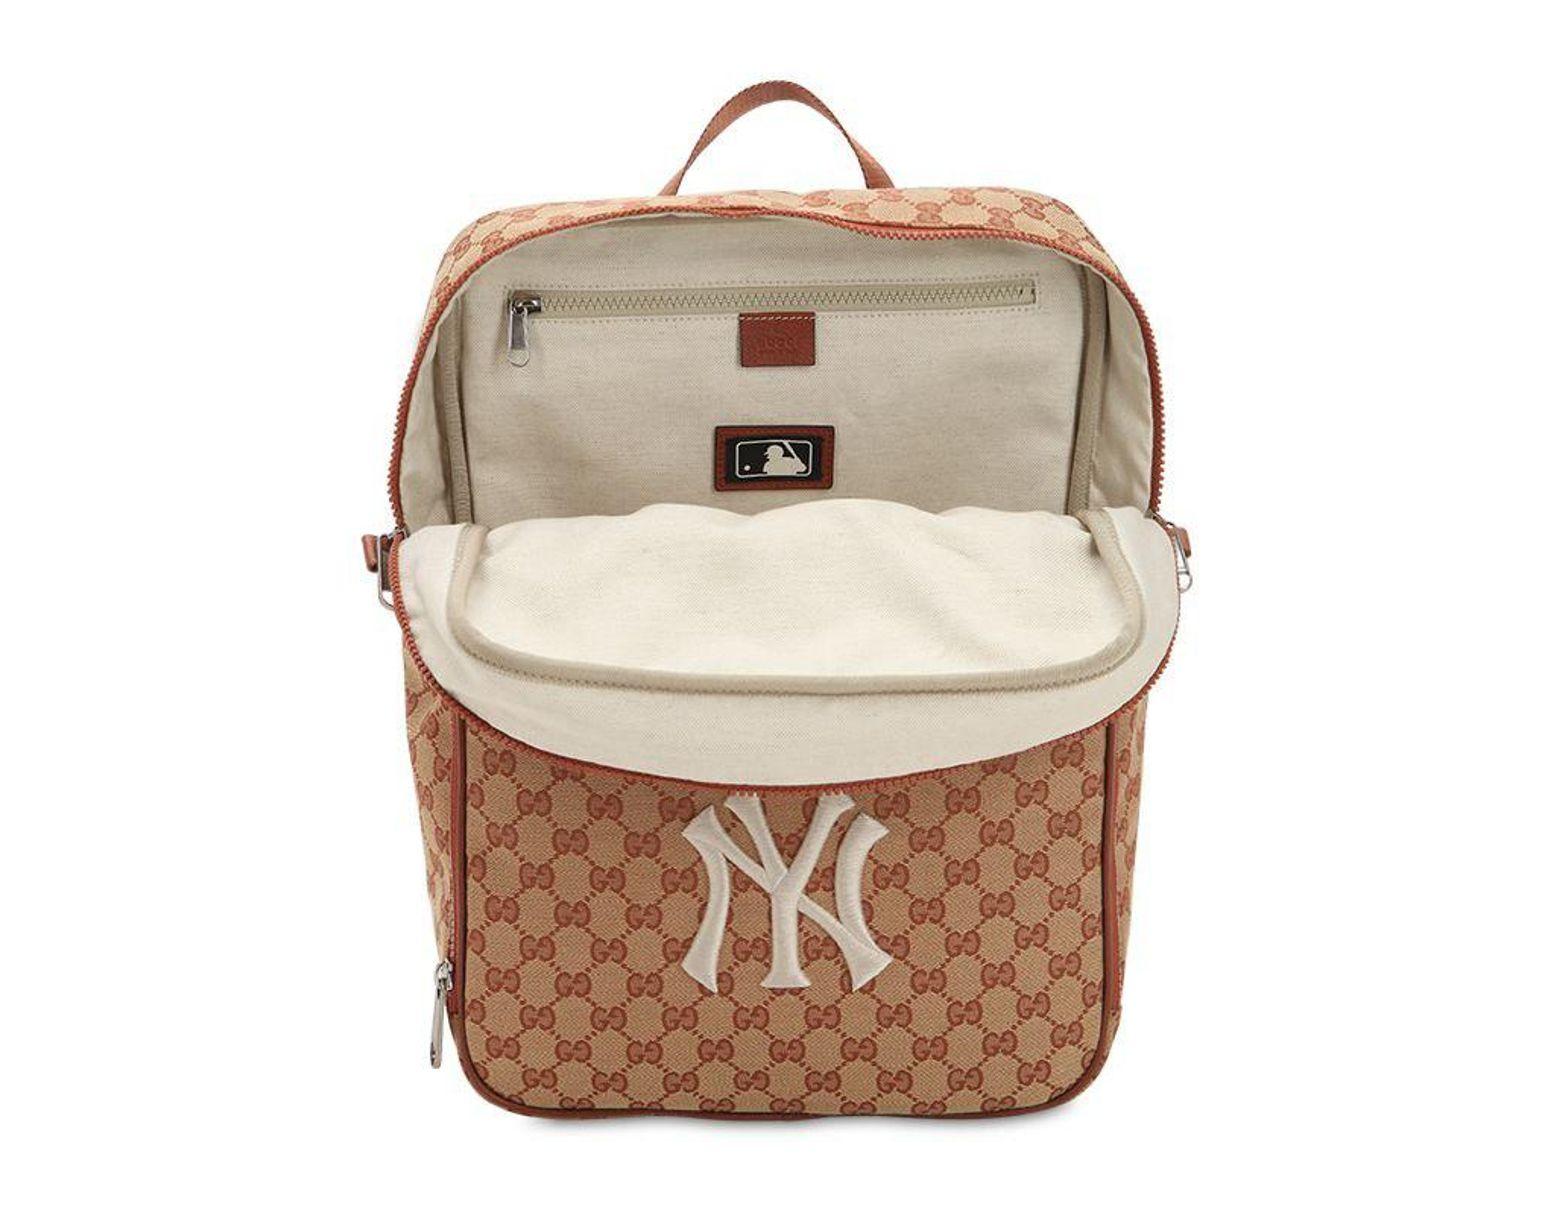 939cdd976a0f Gucci Original Gg Supreme Logo Backpack in Natural for Men - Lyst